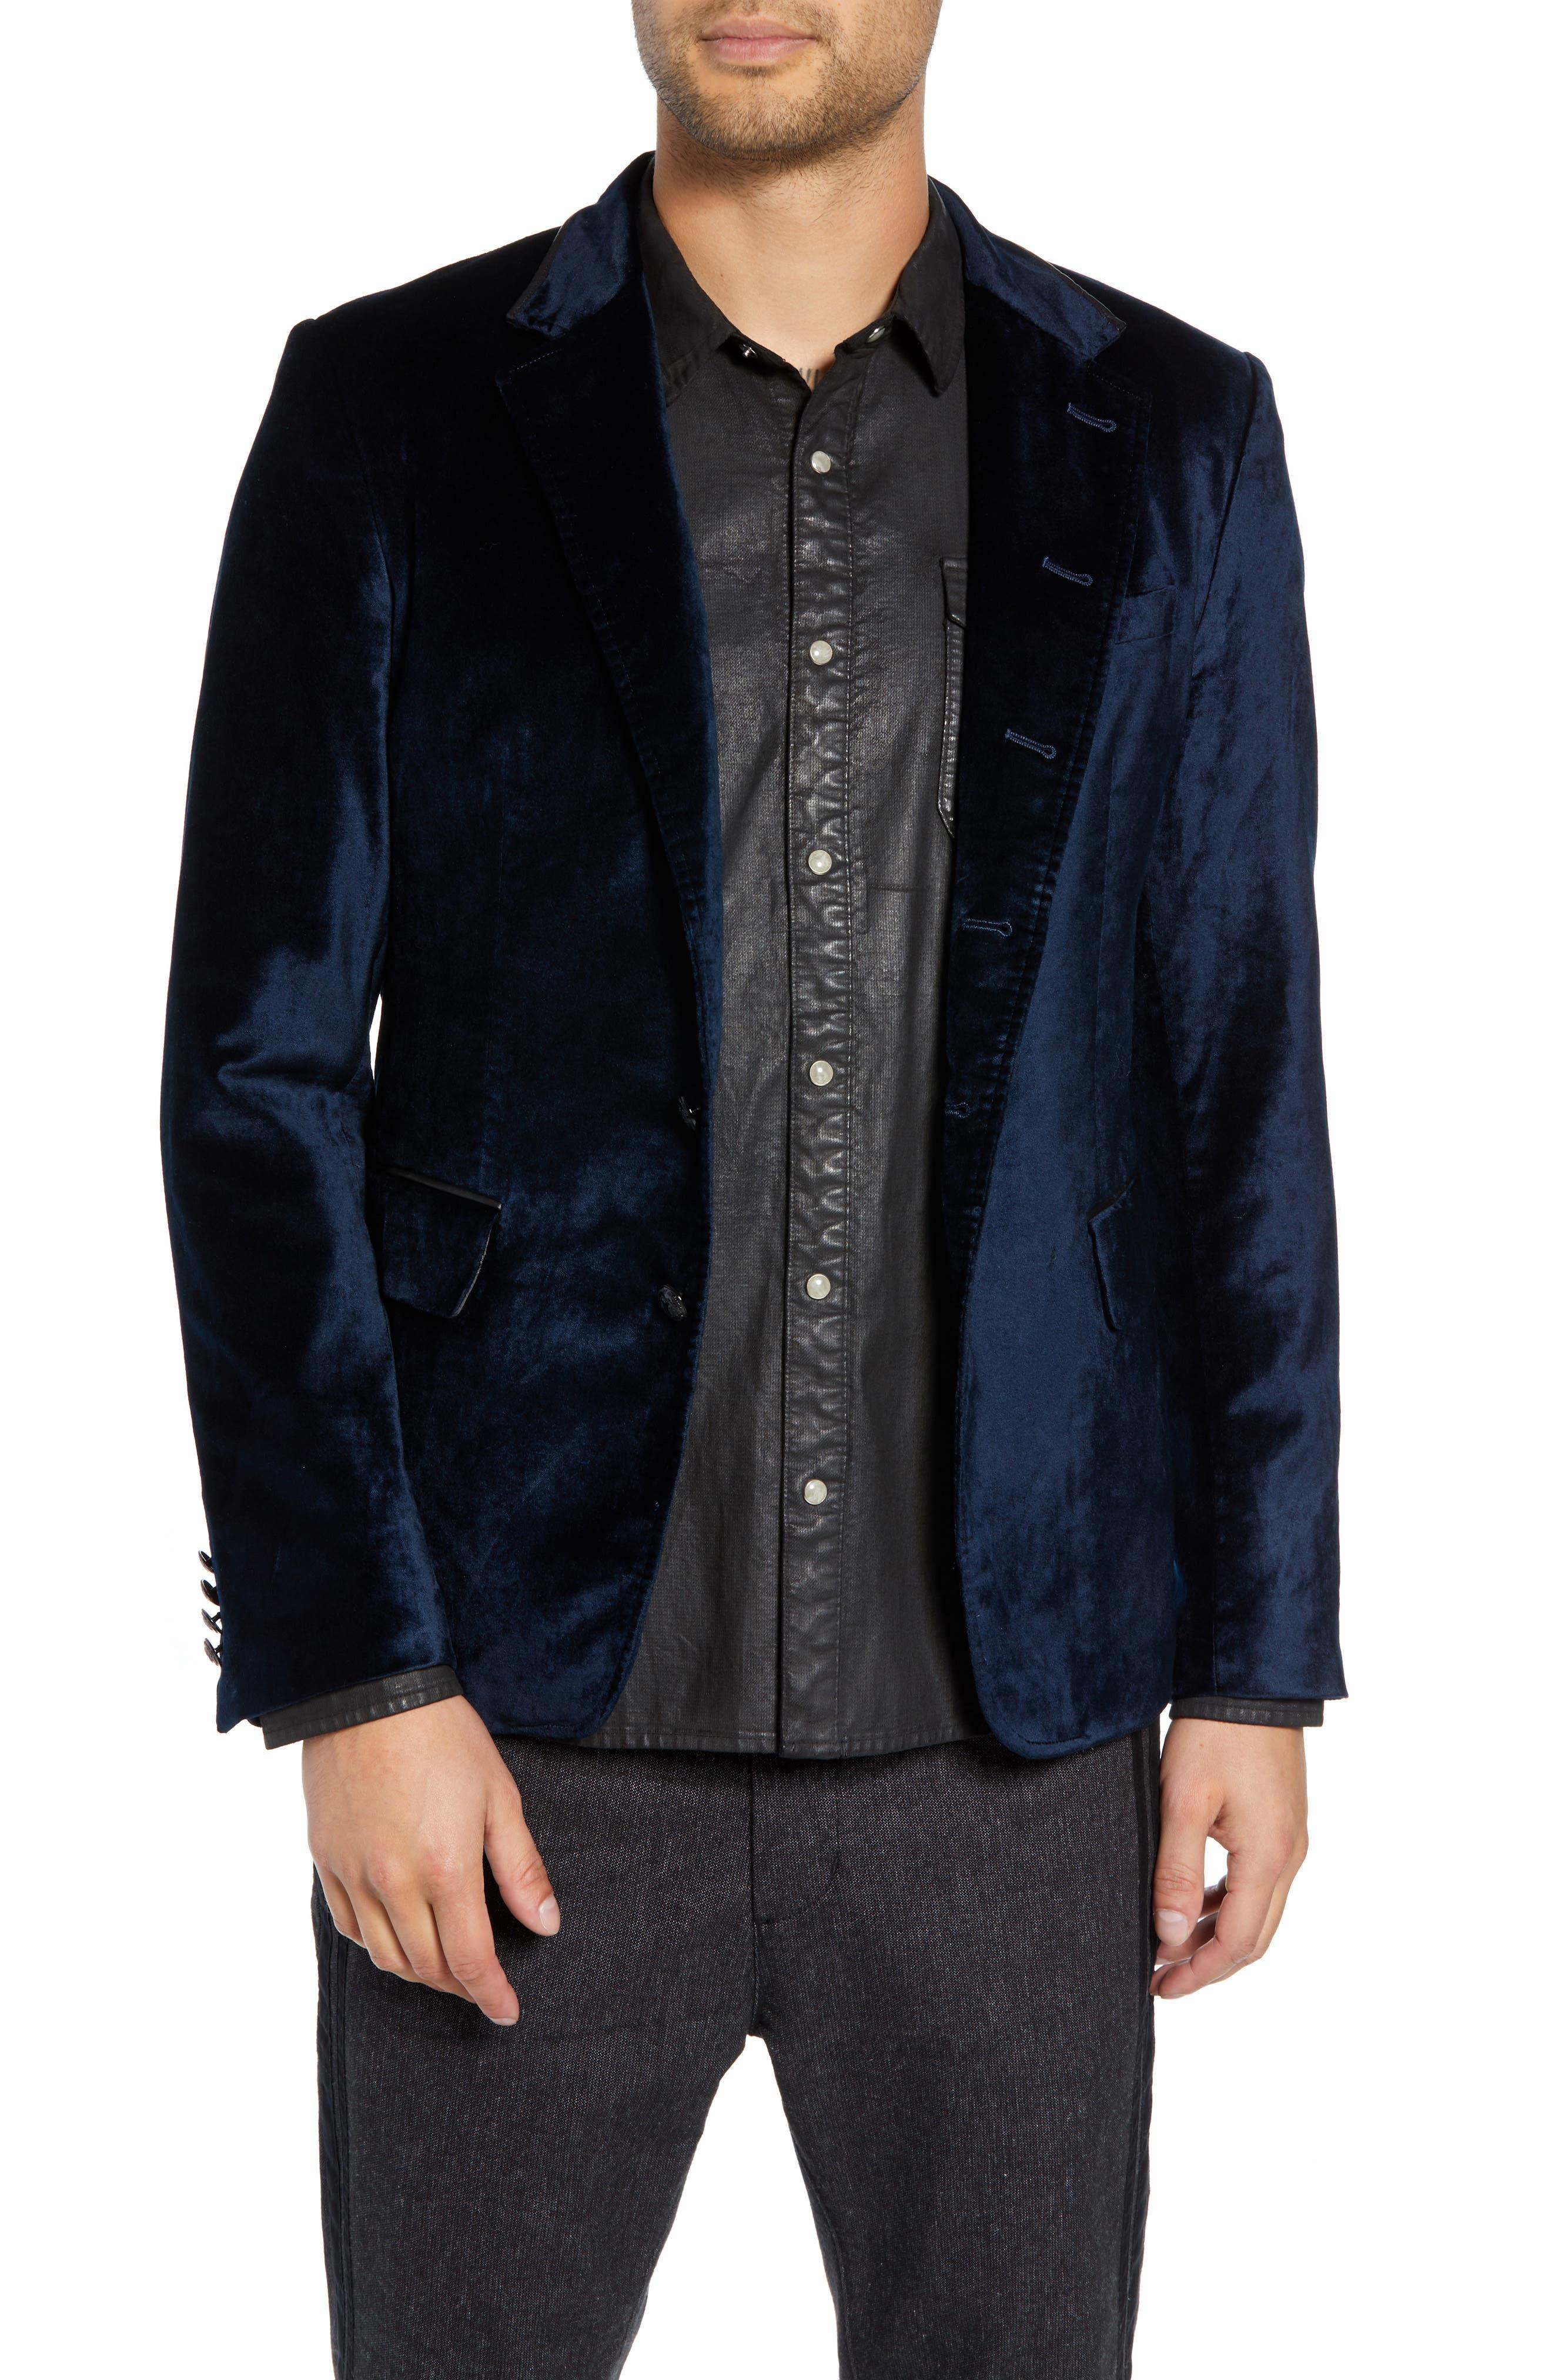 Velvet Dinner Jacket with Leather Trim,                         Main,                         color, 478